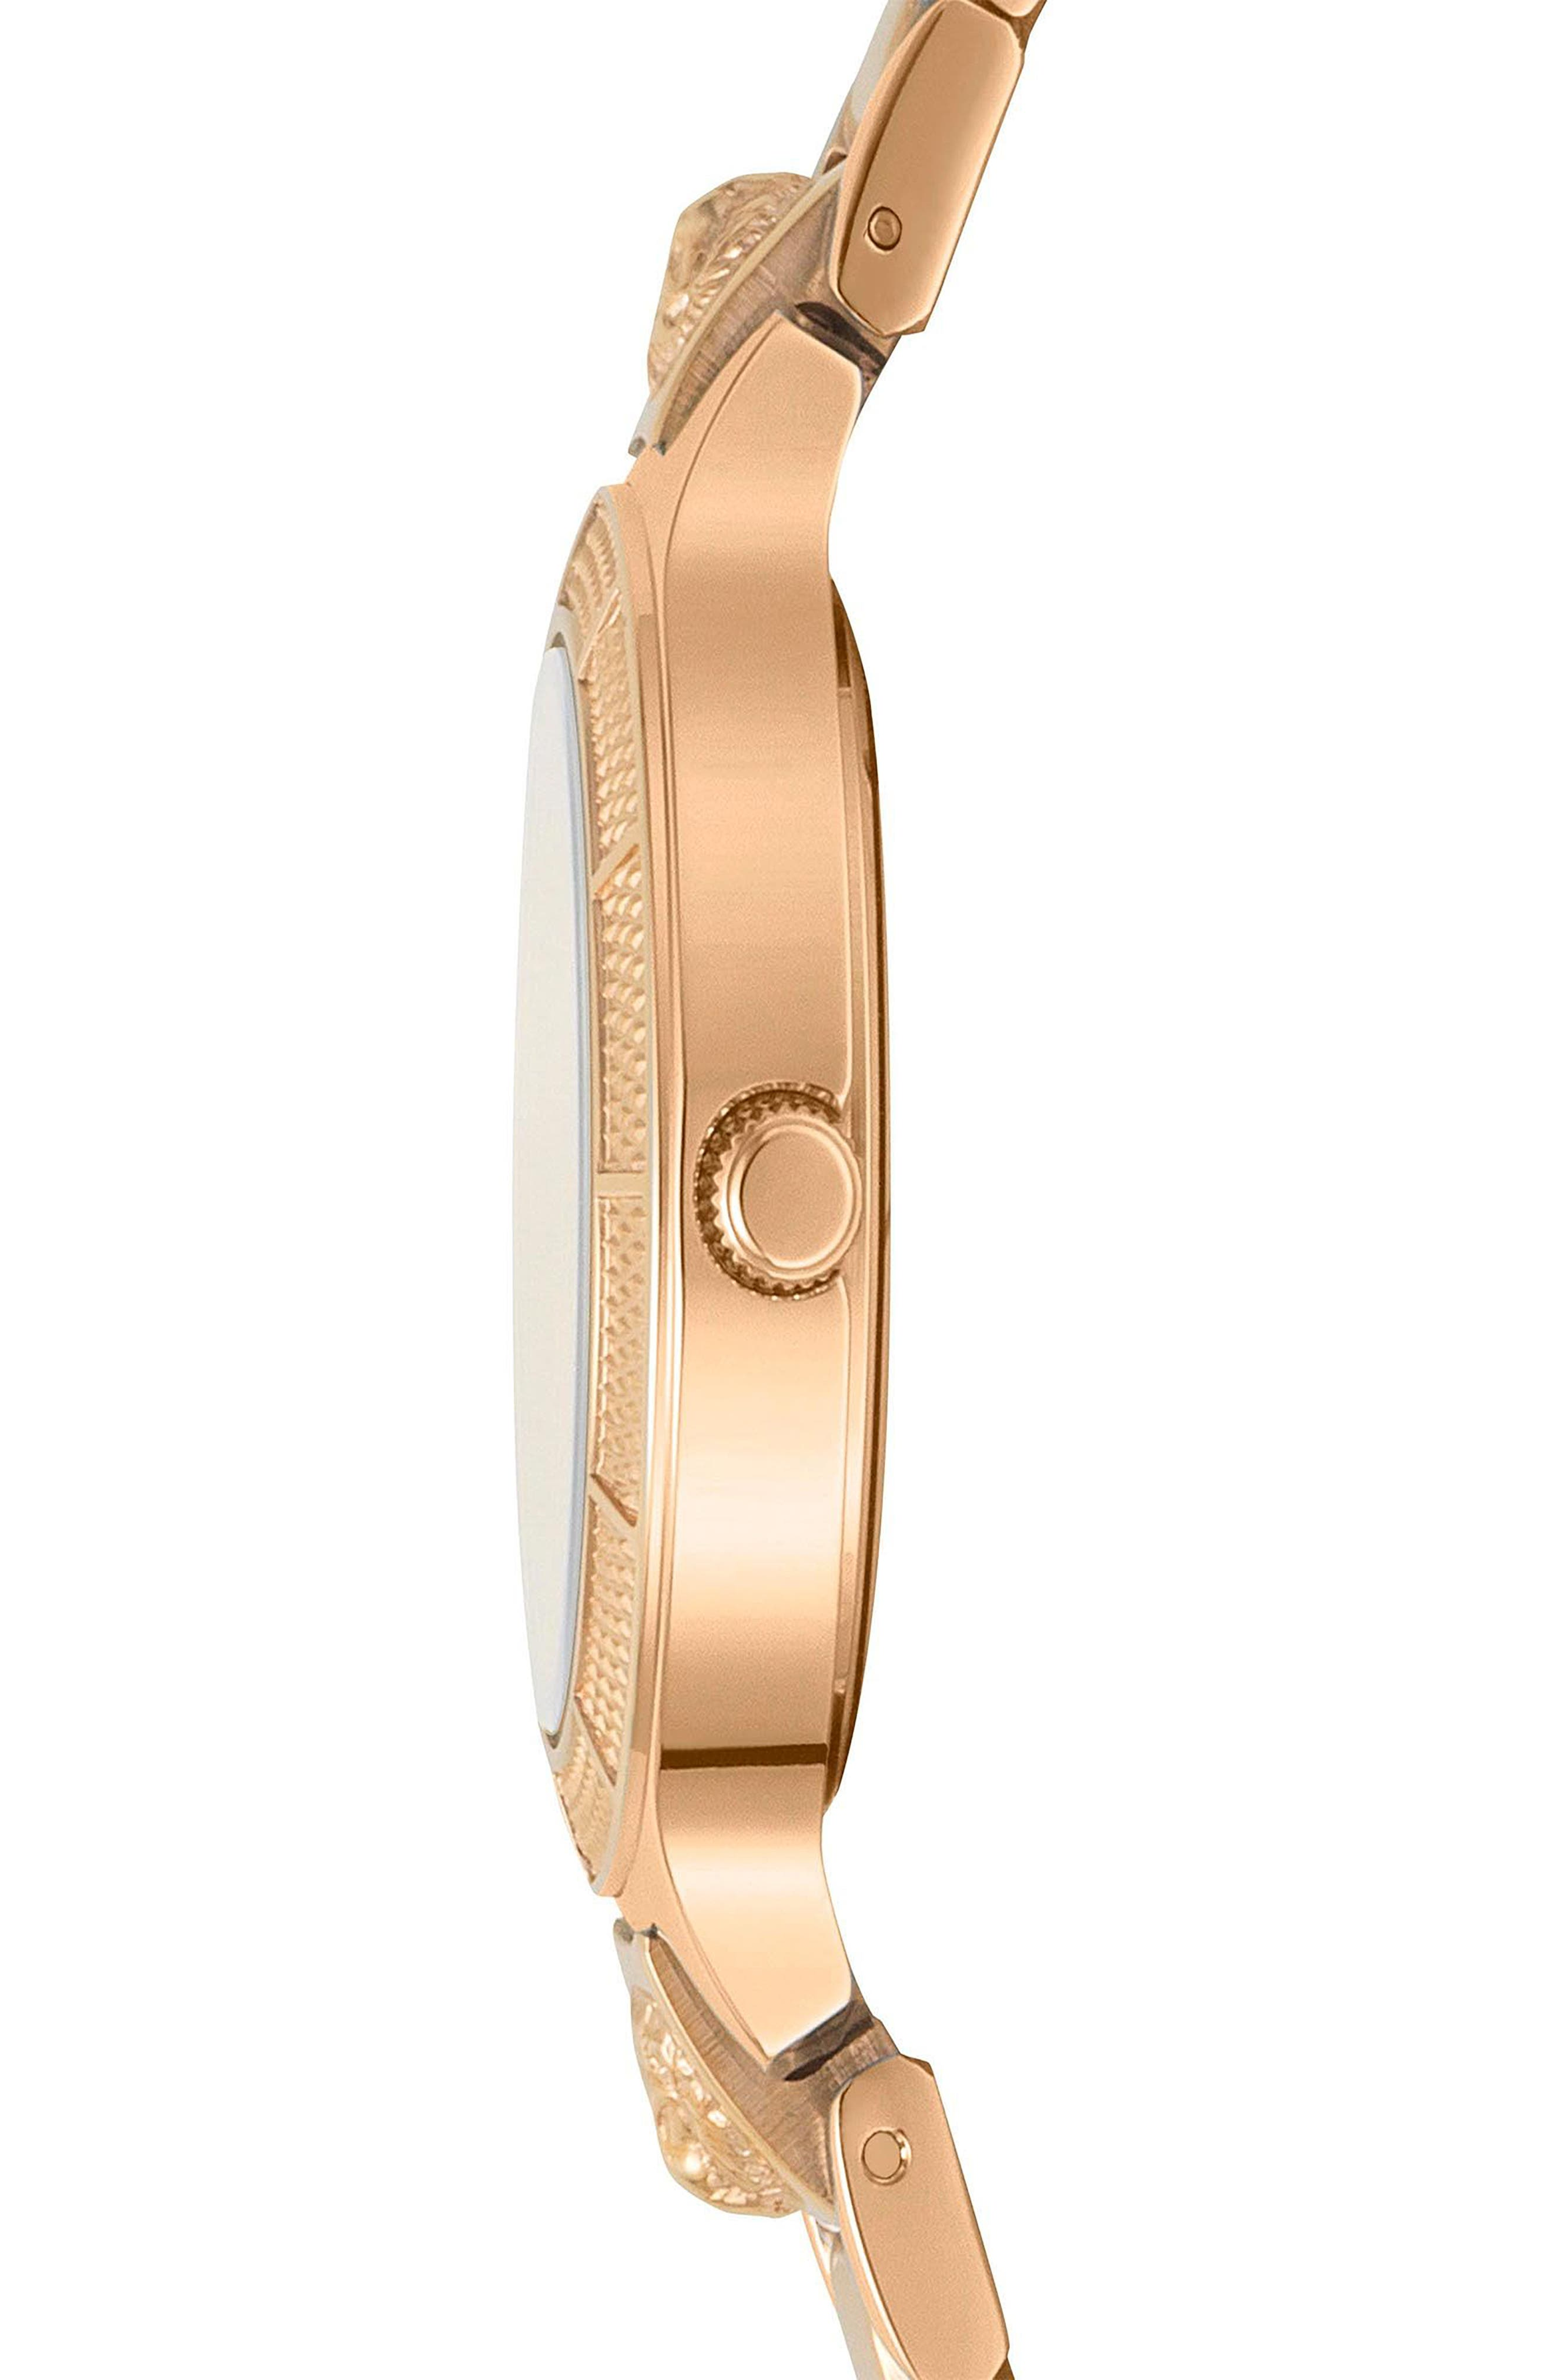 VERSUS by Versace Claremont Bracelet Watch, 32mm,                             Alternate thumbnail 2, color,                             Rose Gold/ Green/ Rose Gold